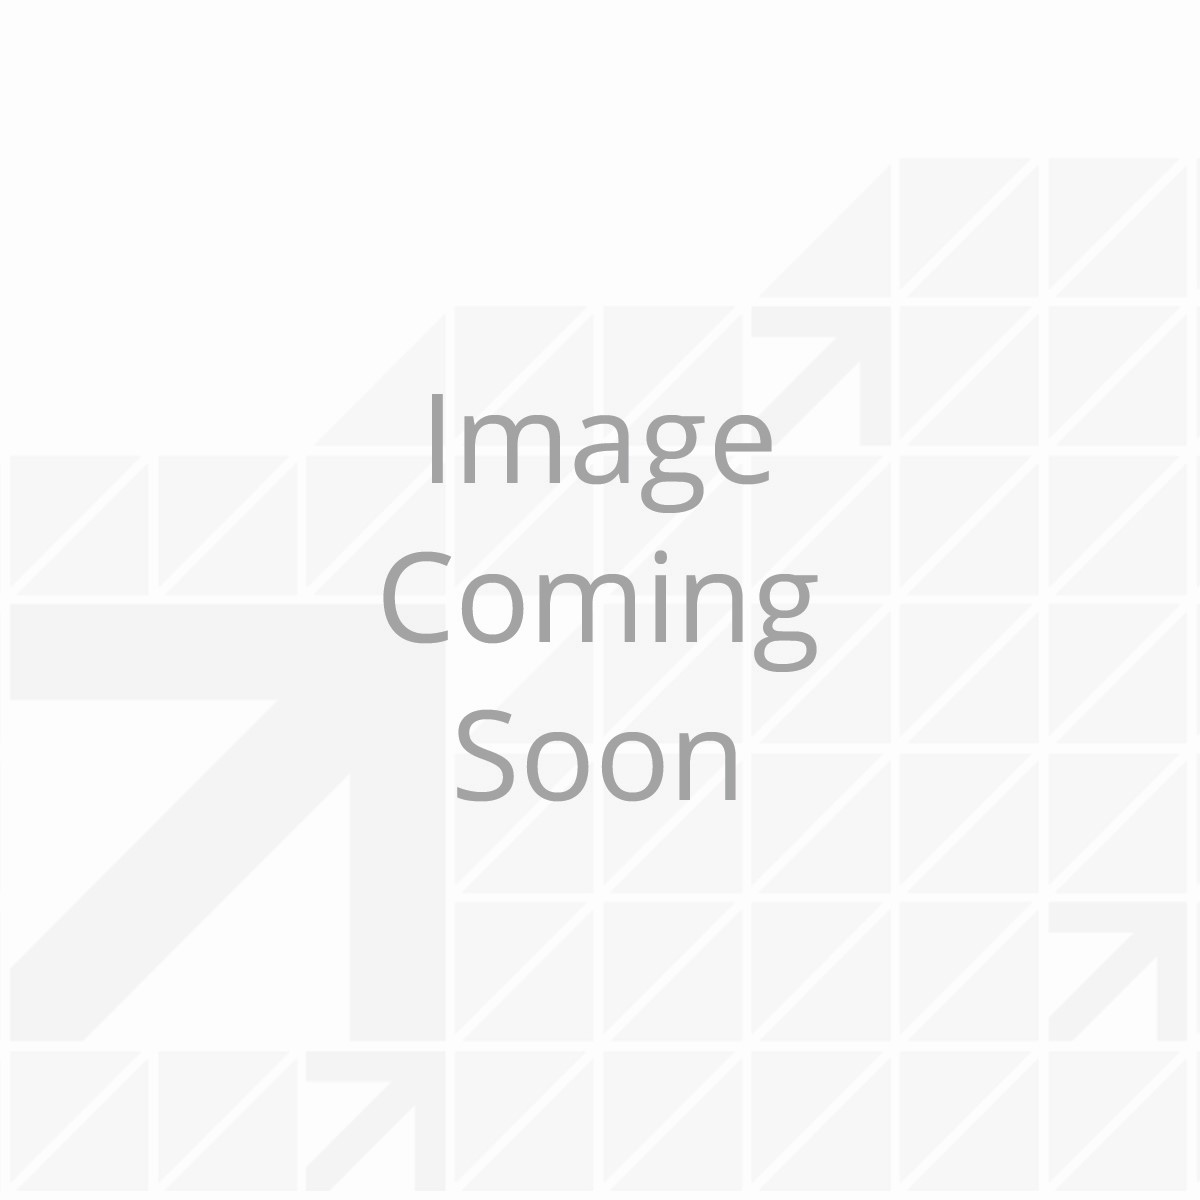 50A 125/250V Female Locking Connector - Black